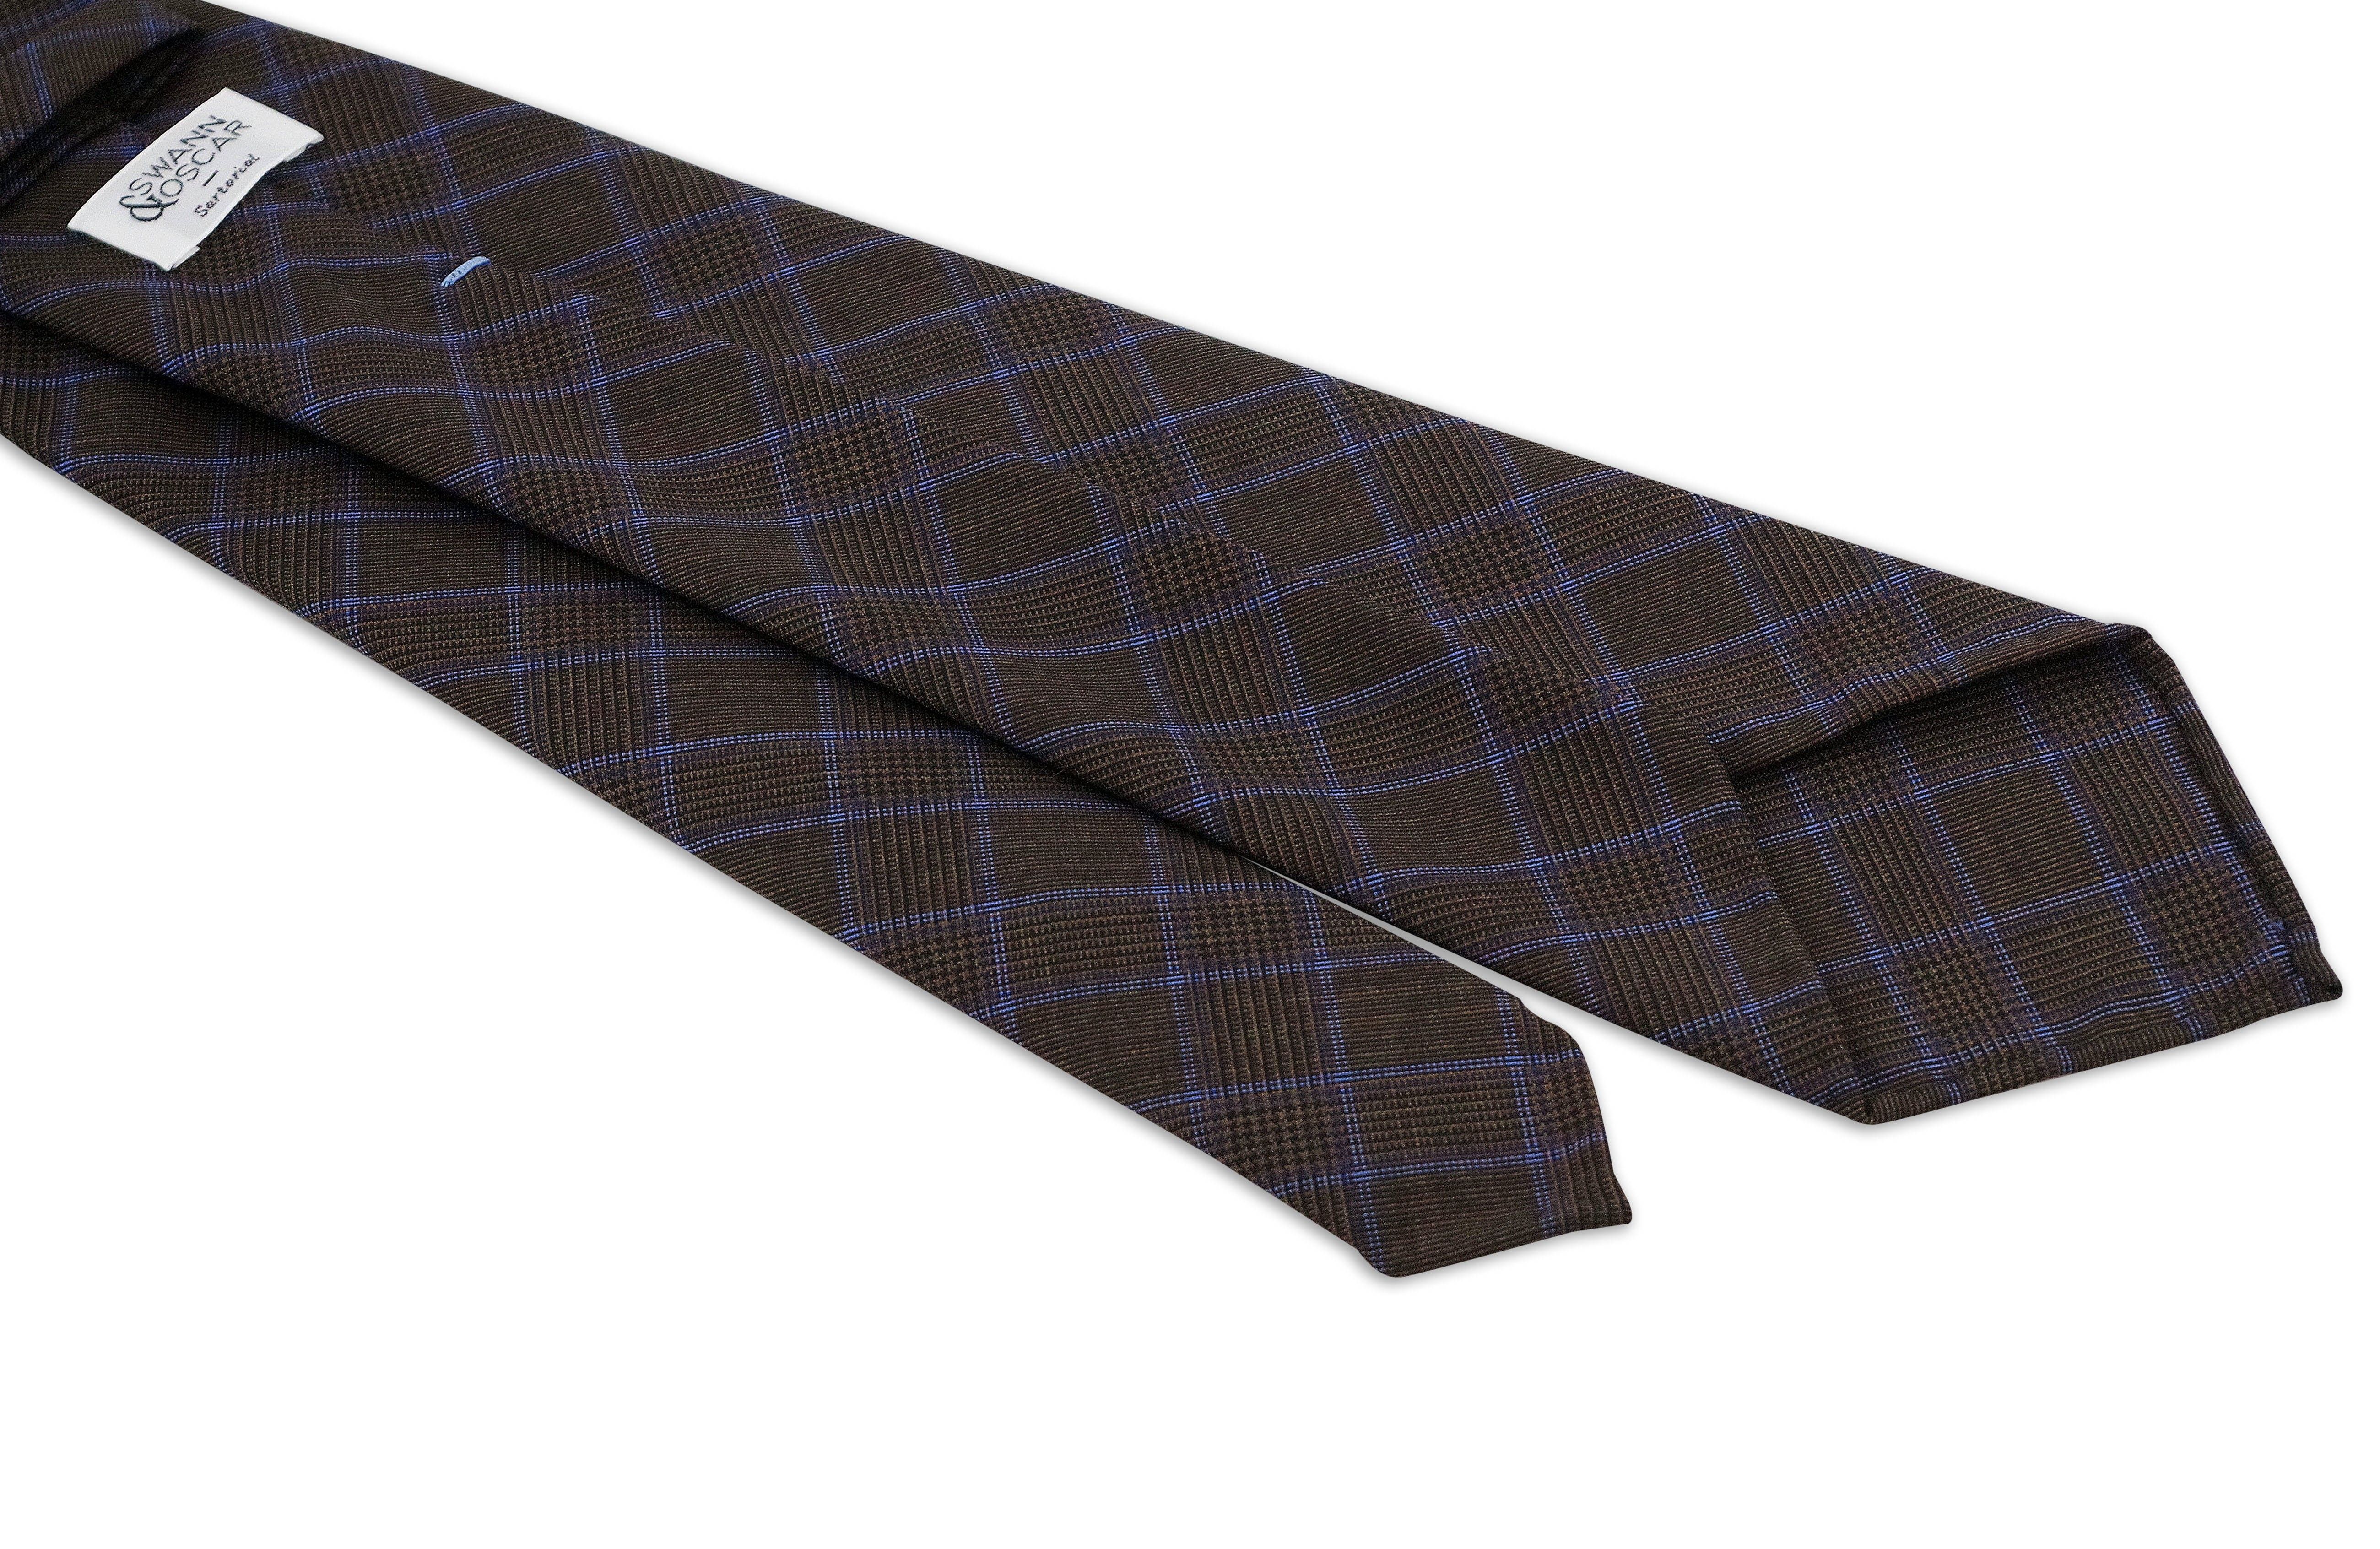 cravate marron rayures bleu luxe cravates accessoires swann oscar. Black Bedroom Furniture Sets. Home Design Ideas